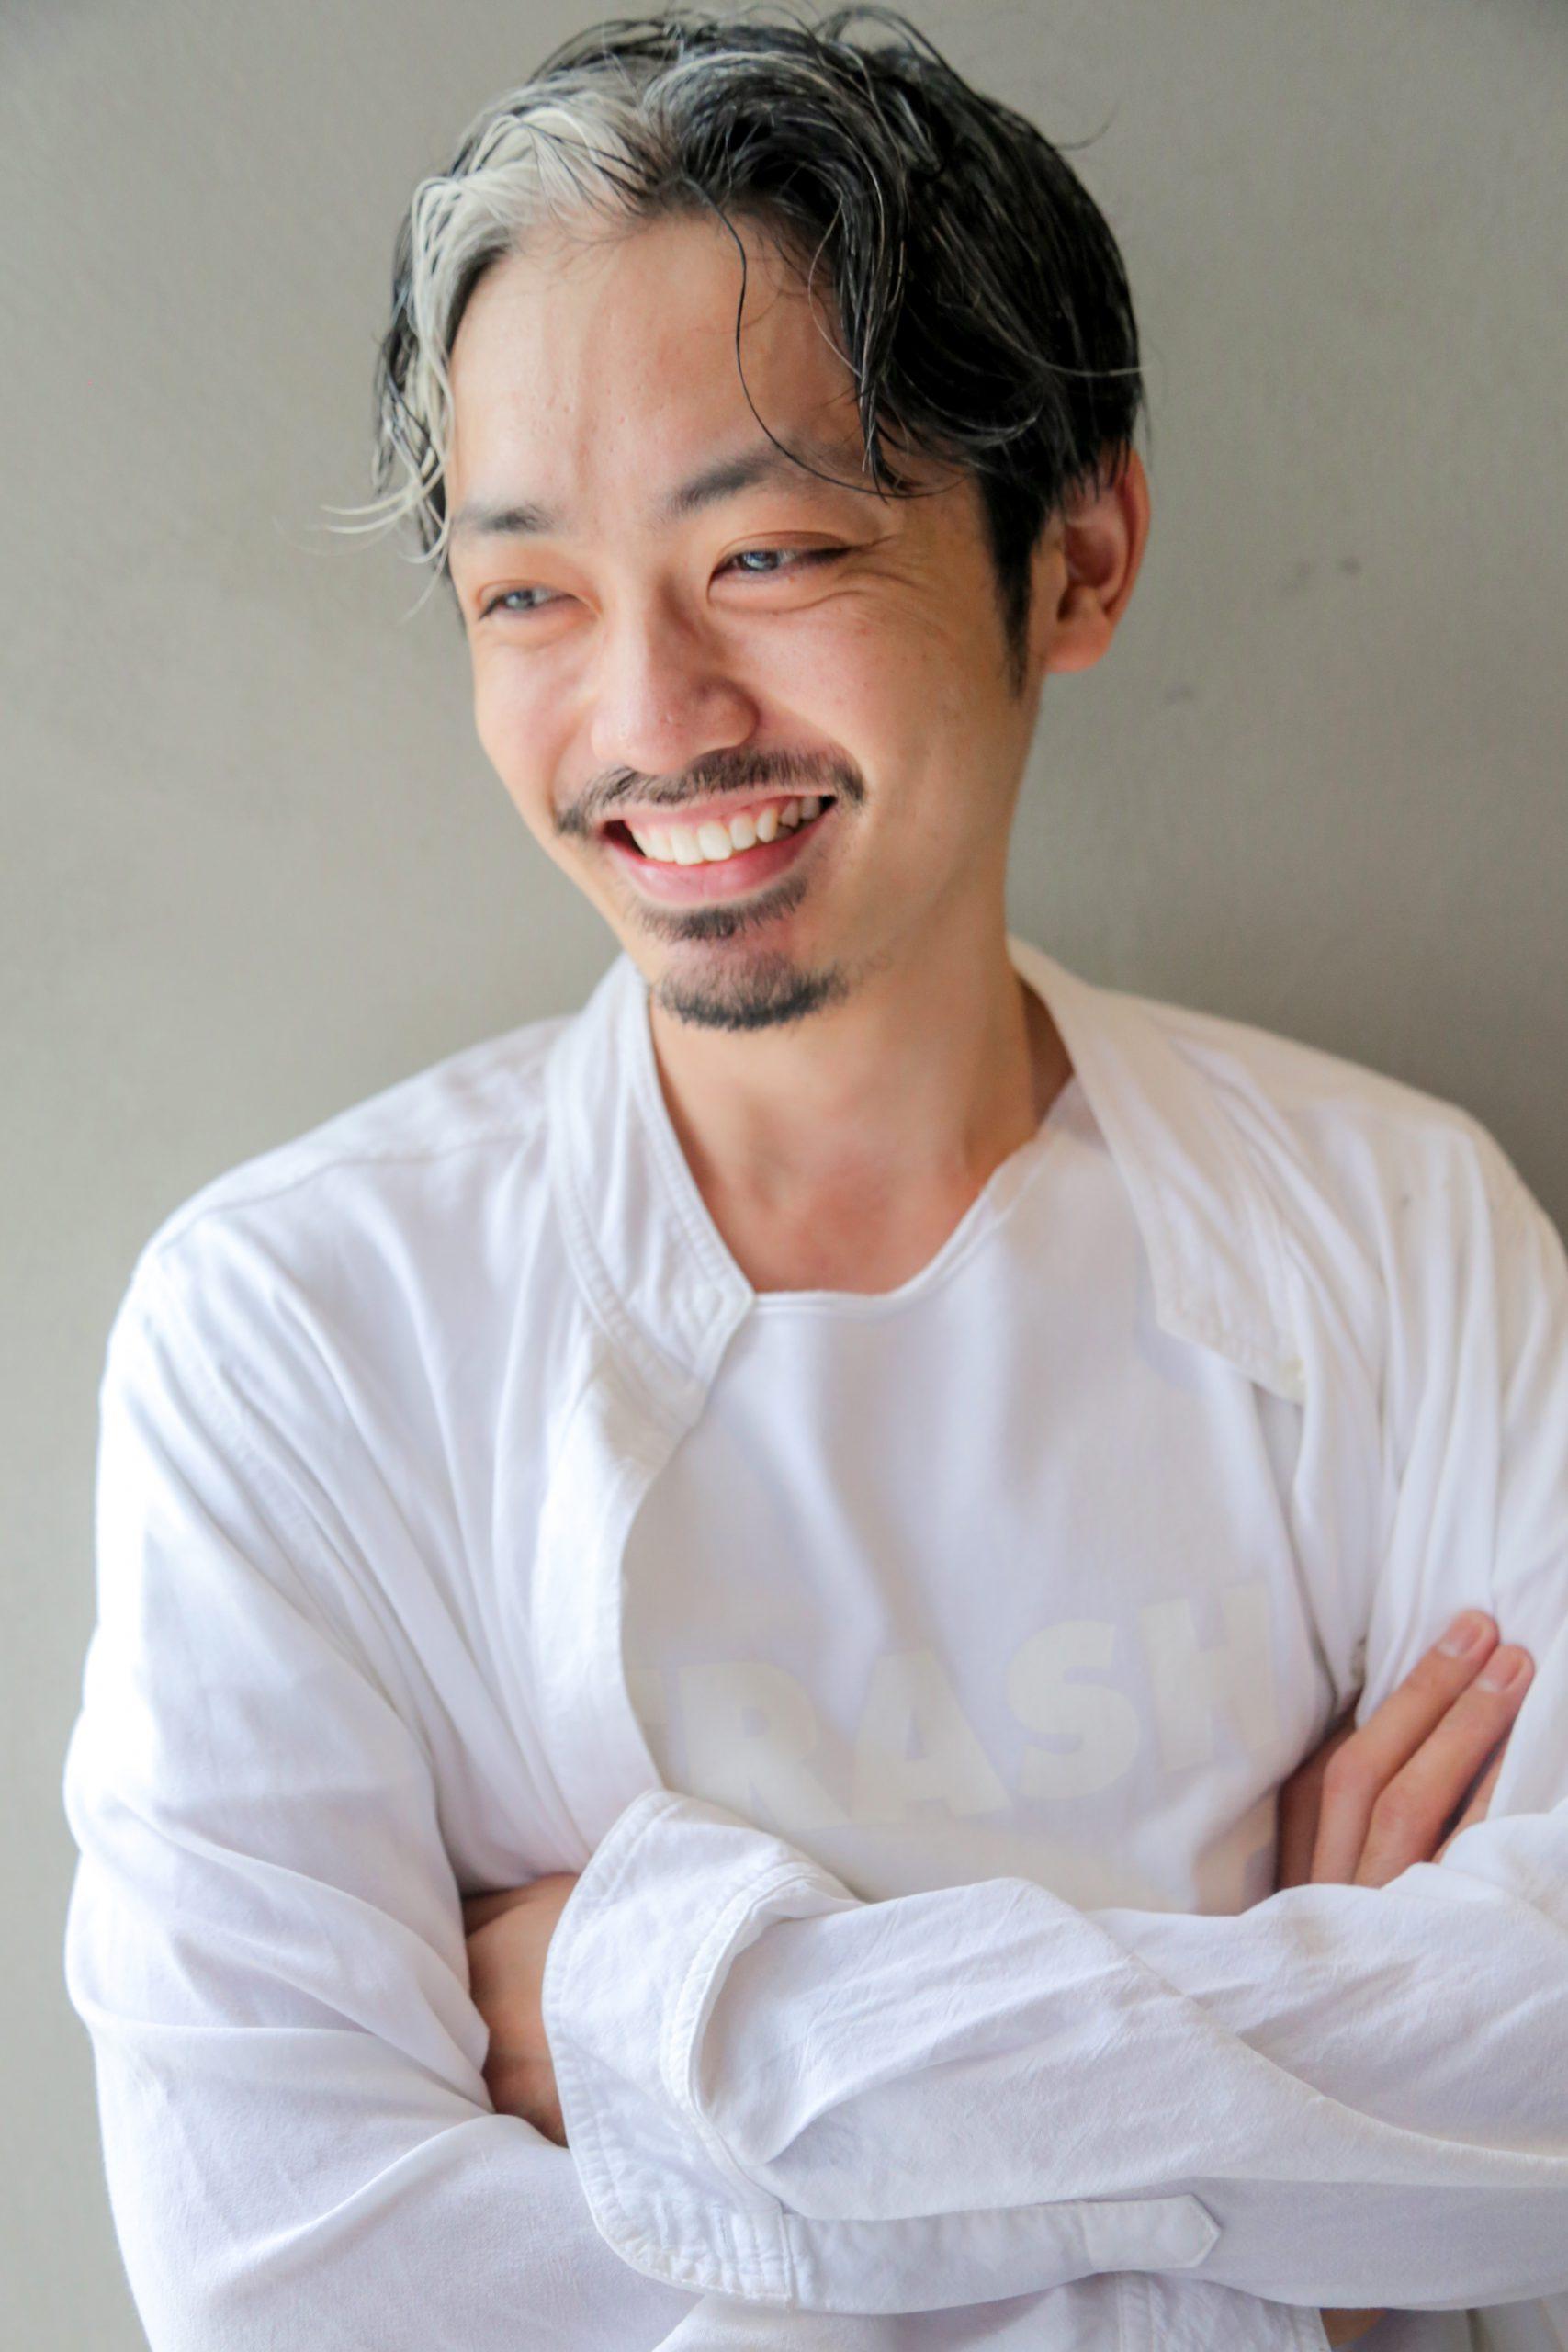 fukuda's featured picture